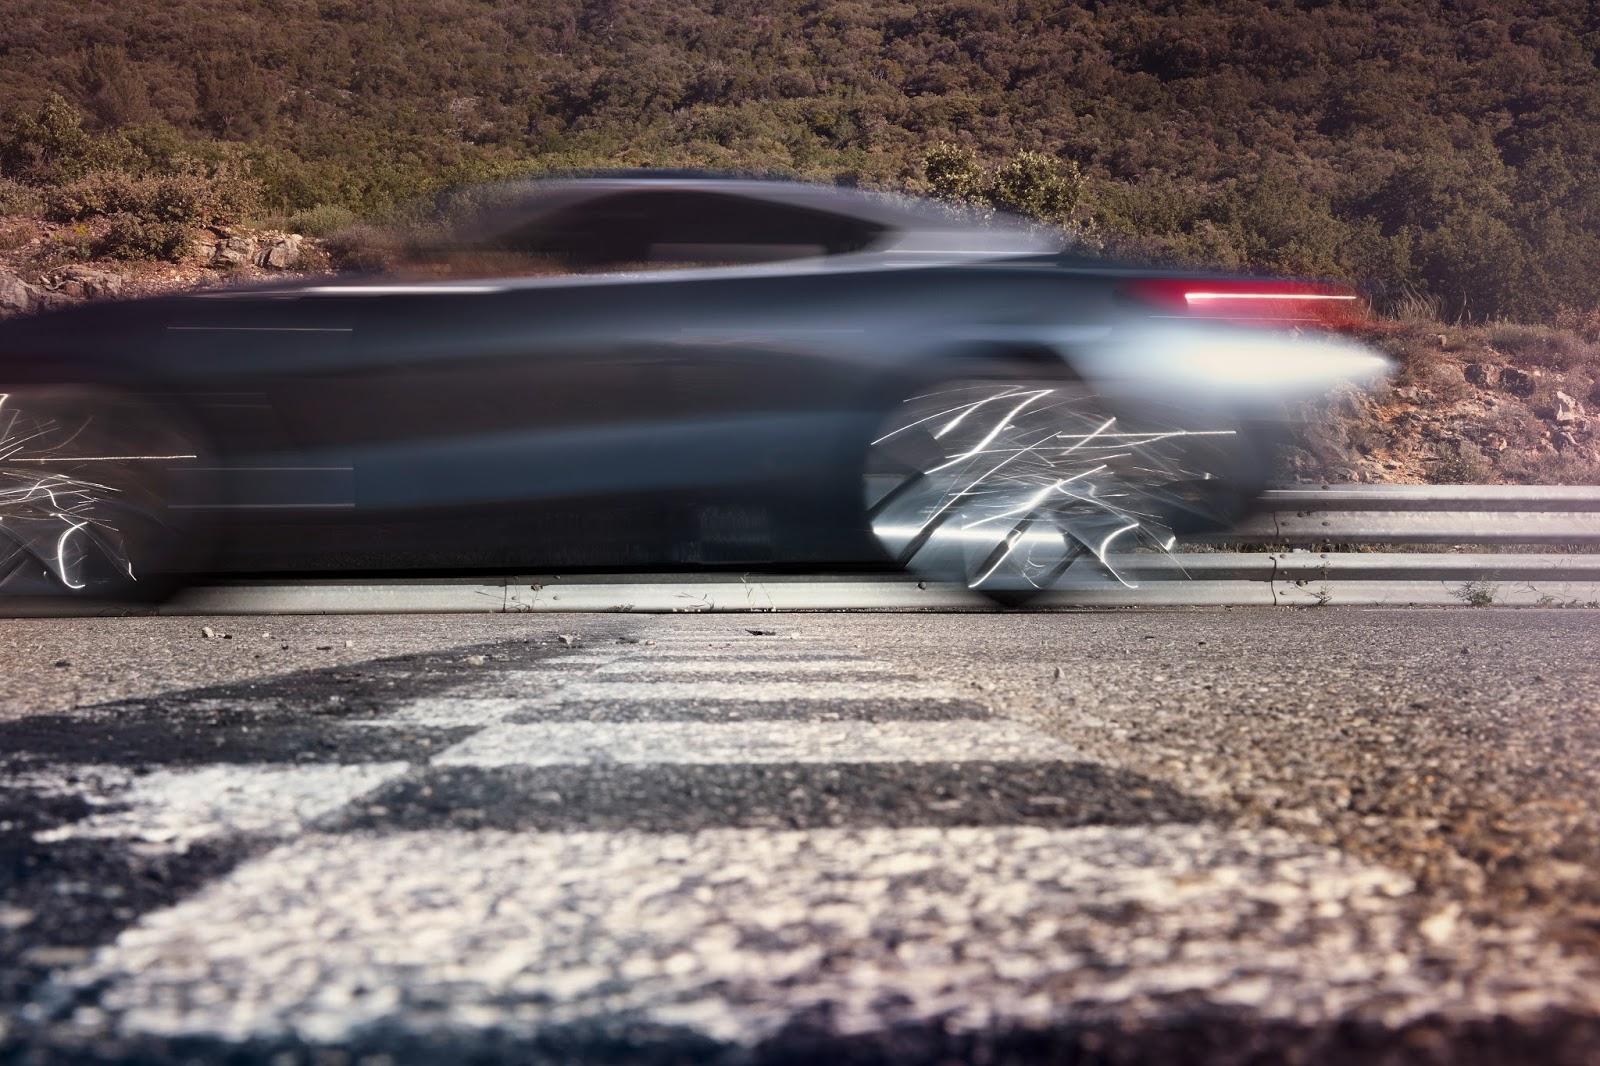 P90261174 highRes bmw concept 8 series Η BMW Σειρά 8 Coupe είναι η πεμπτουσία των μελλοντικών σπορ αυτοκινήτων BMW, BMW 8, BMW Concept, BMW Concept 8 Series, COUPE, dream car